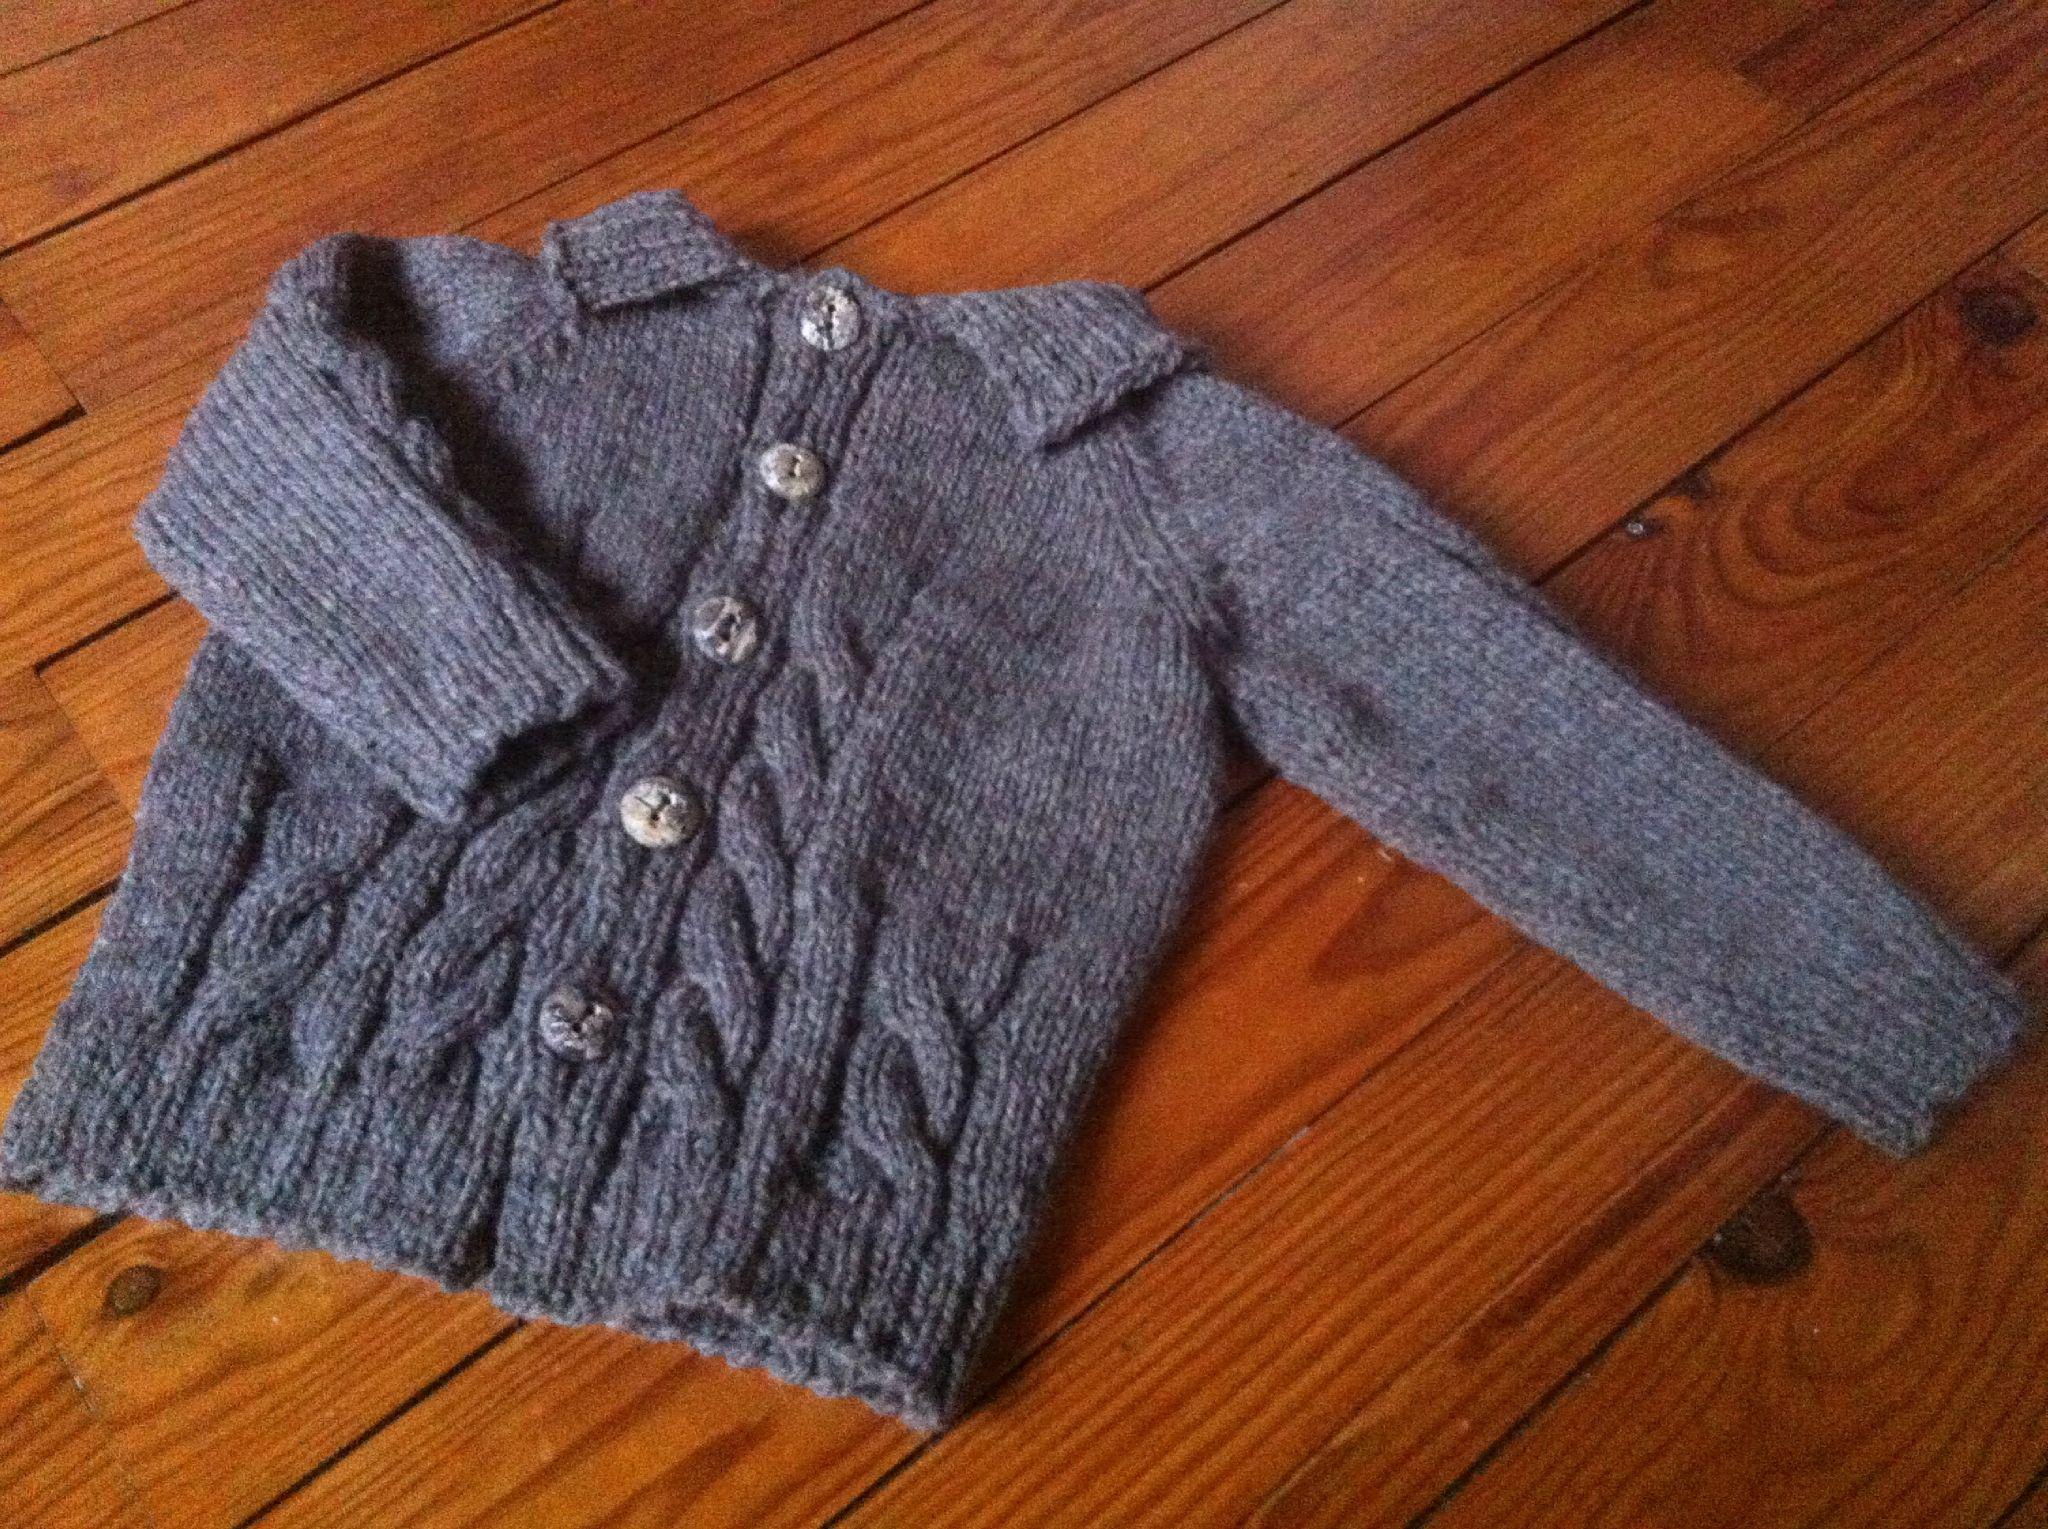 modele tricot veste garcon | Modele tricot, Gilet bebe tricot, Modele tricot enfant